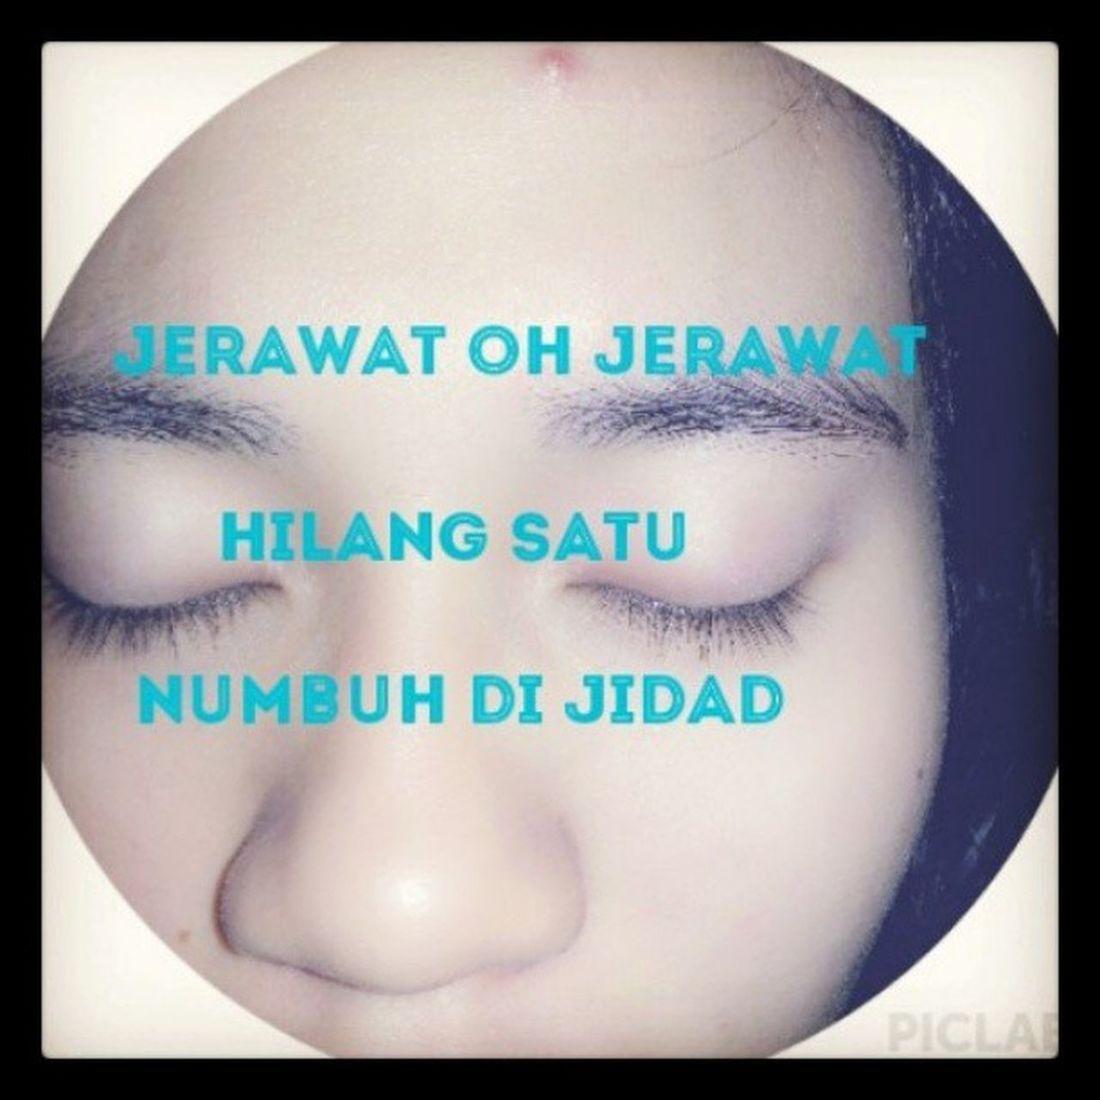 Jerawat Jidat Gawat Dahsyat